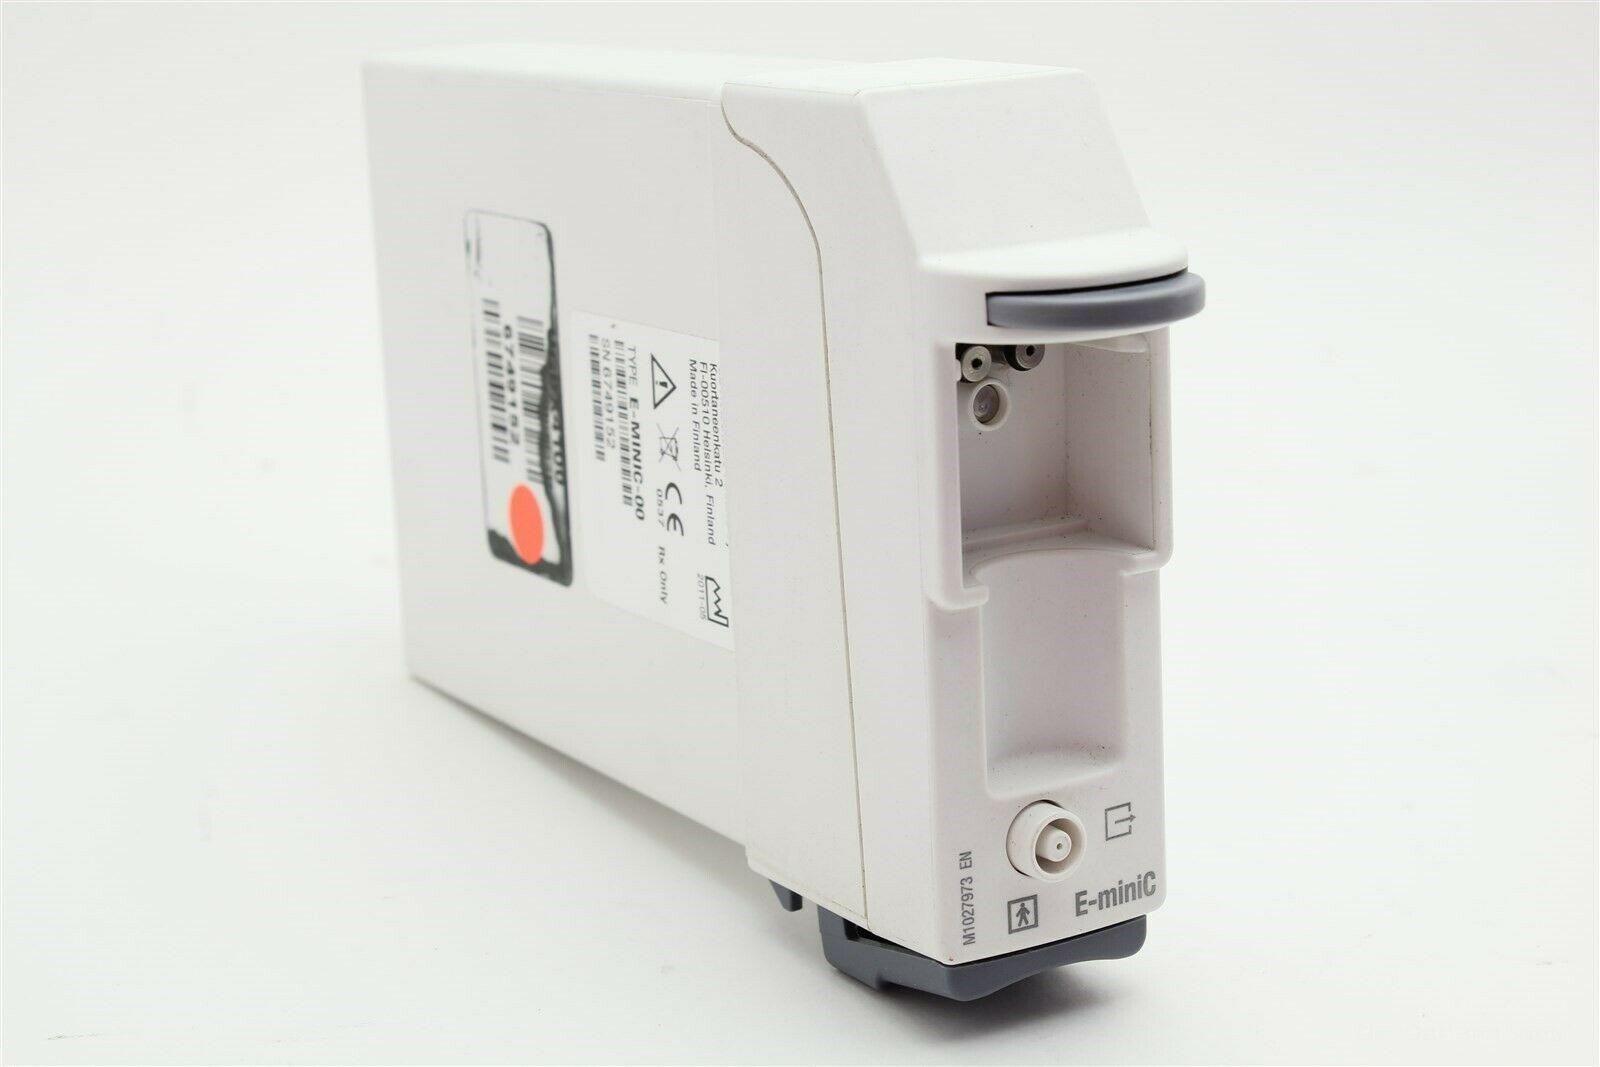 GE Carescape E-miniC Gas Exhaust Airway CO2 Anesthesia Module